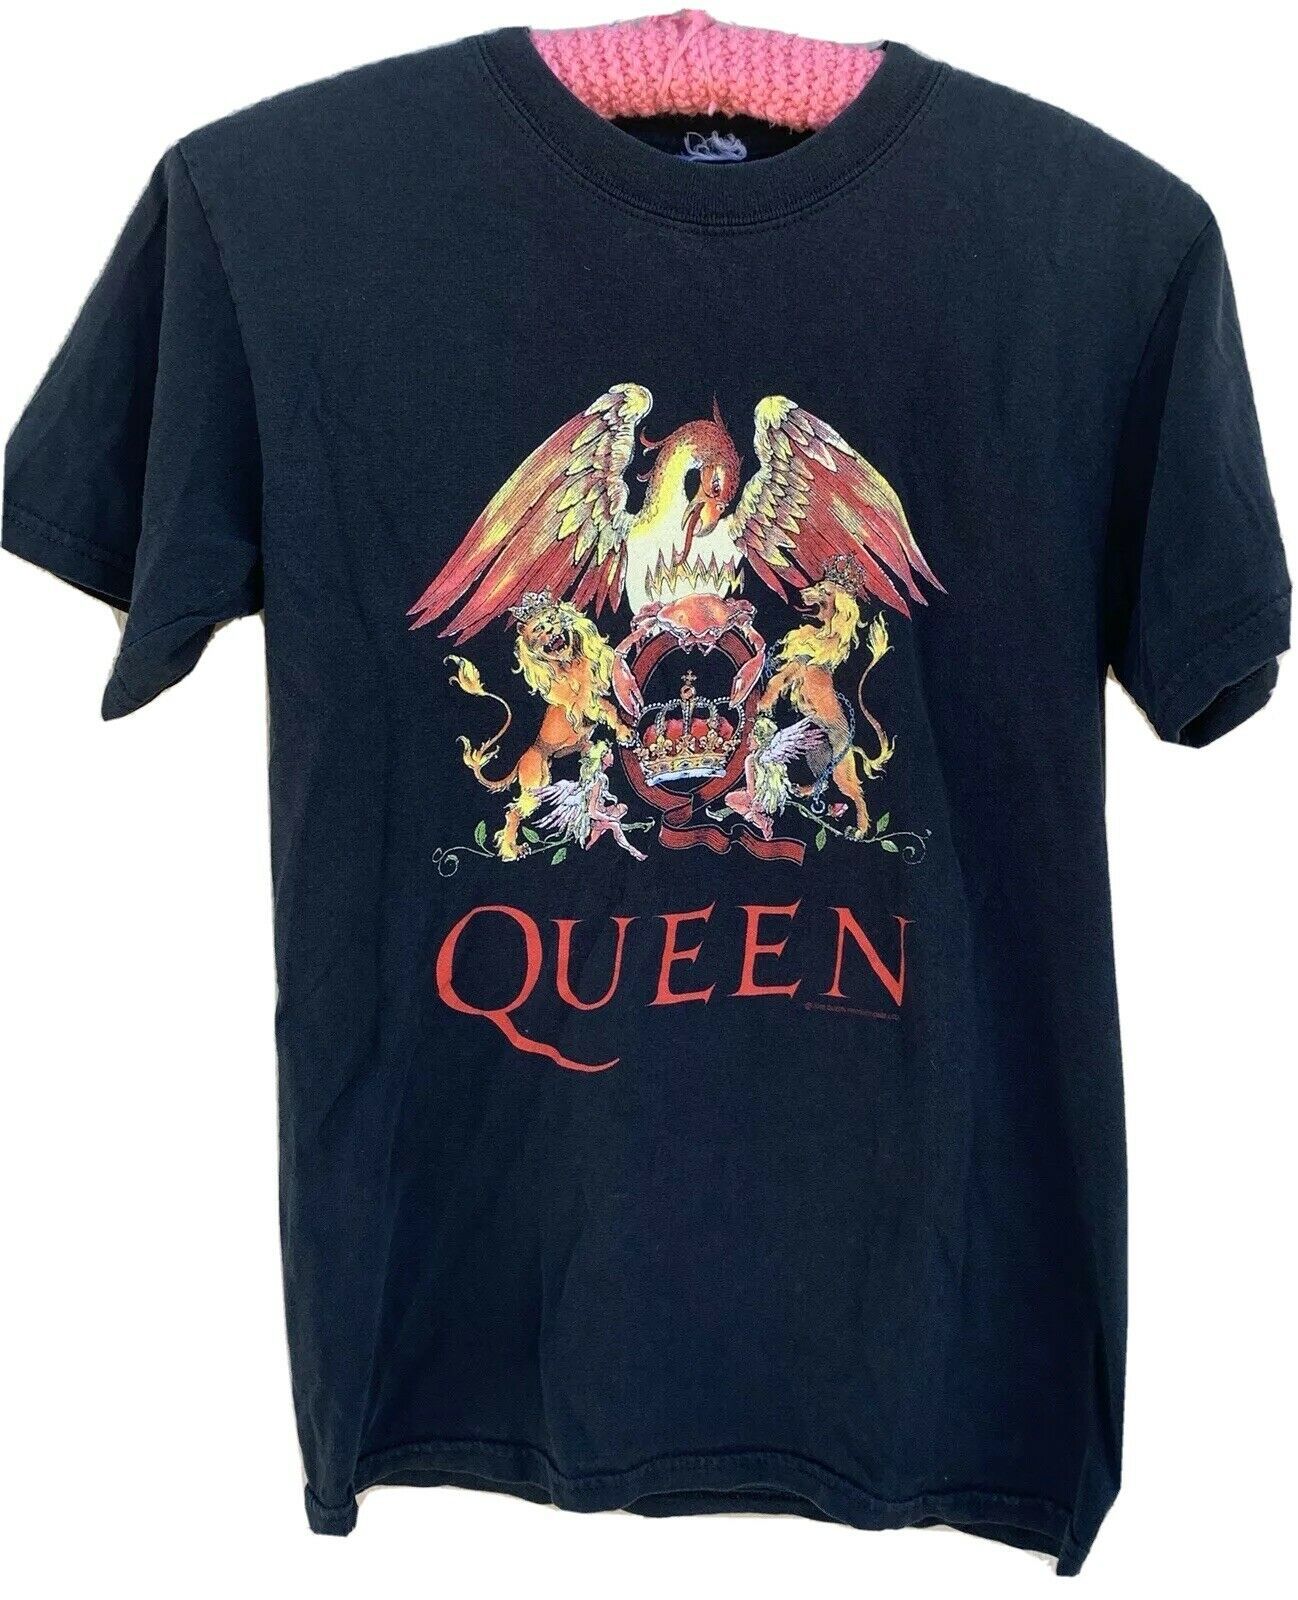 Queen Freddie Brian Roger John T-Shirt Graphics O… - image 1